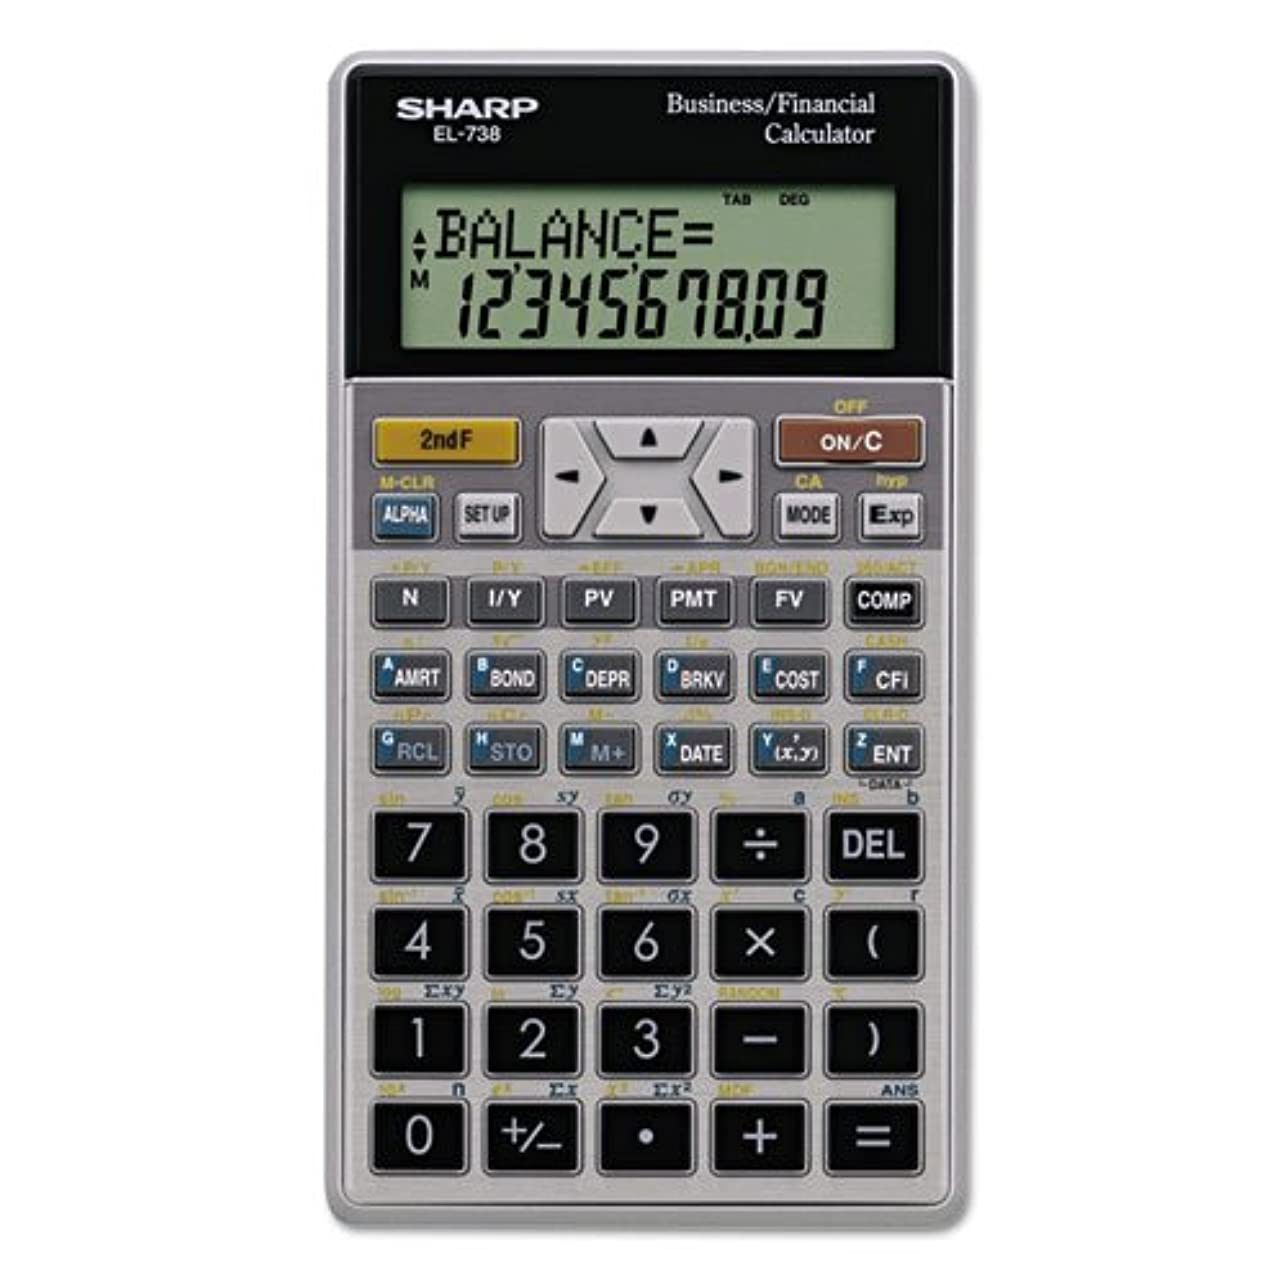 Sharp電子機器Corp el738fb el-738?C金融電卓、10桁LCD